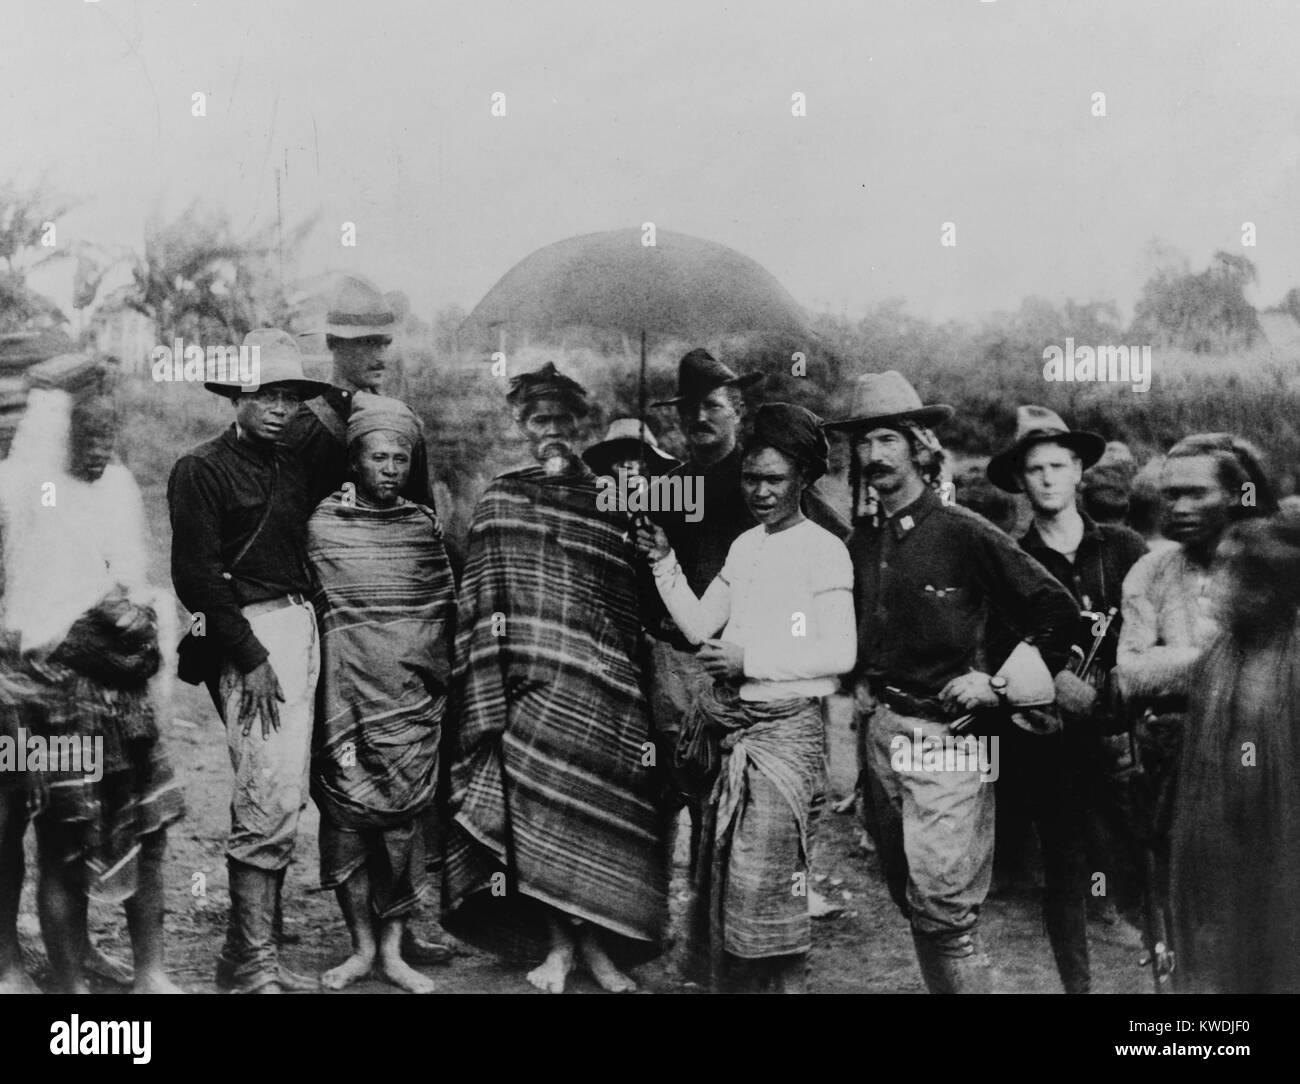 Captain John Pershing standing behind the Rajamunda of Marahai and his slave, holding an umbrella over the Rajamunda. - Stock Image